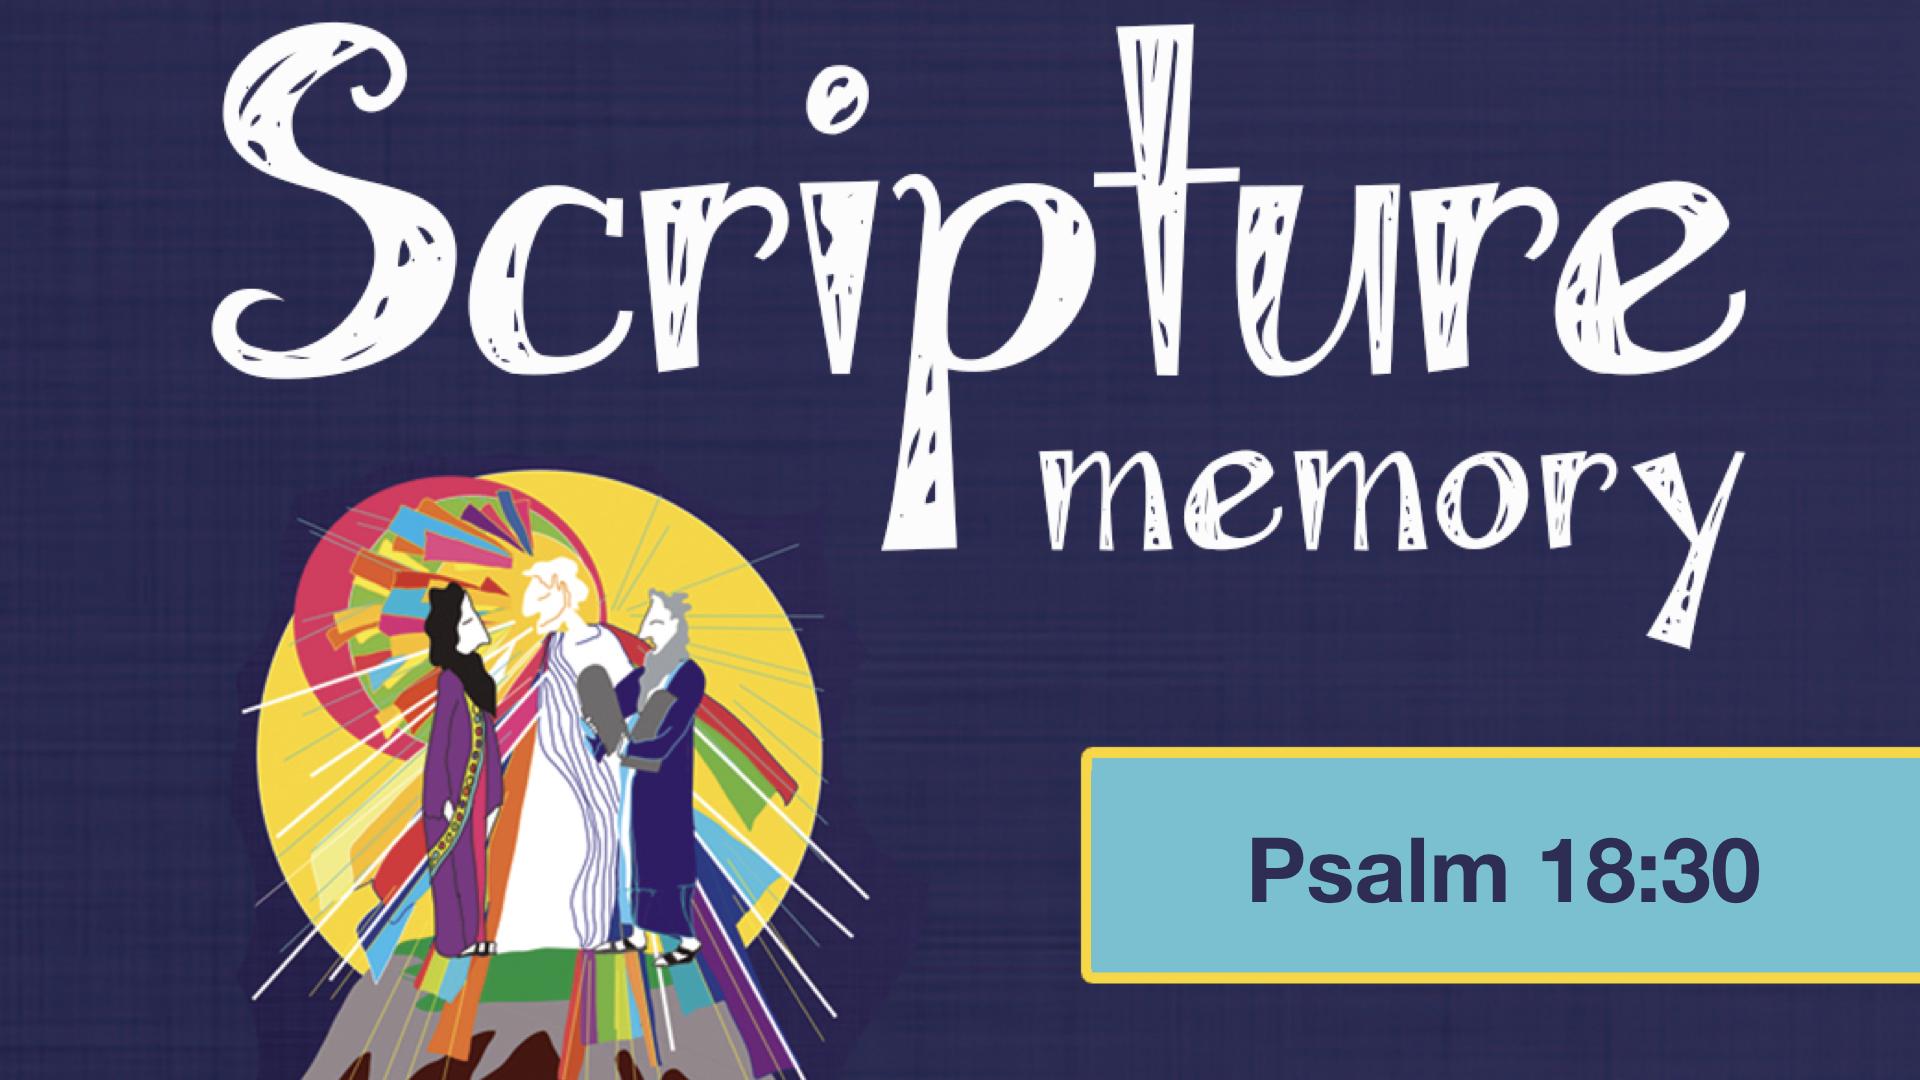 Scripture memory ad_May.001.jpeg